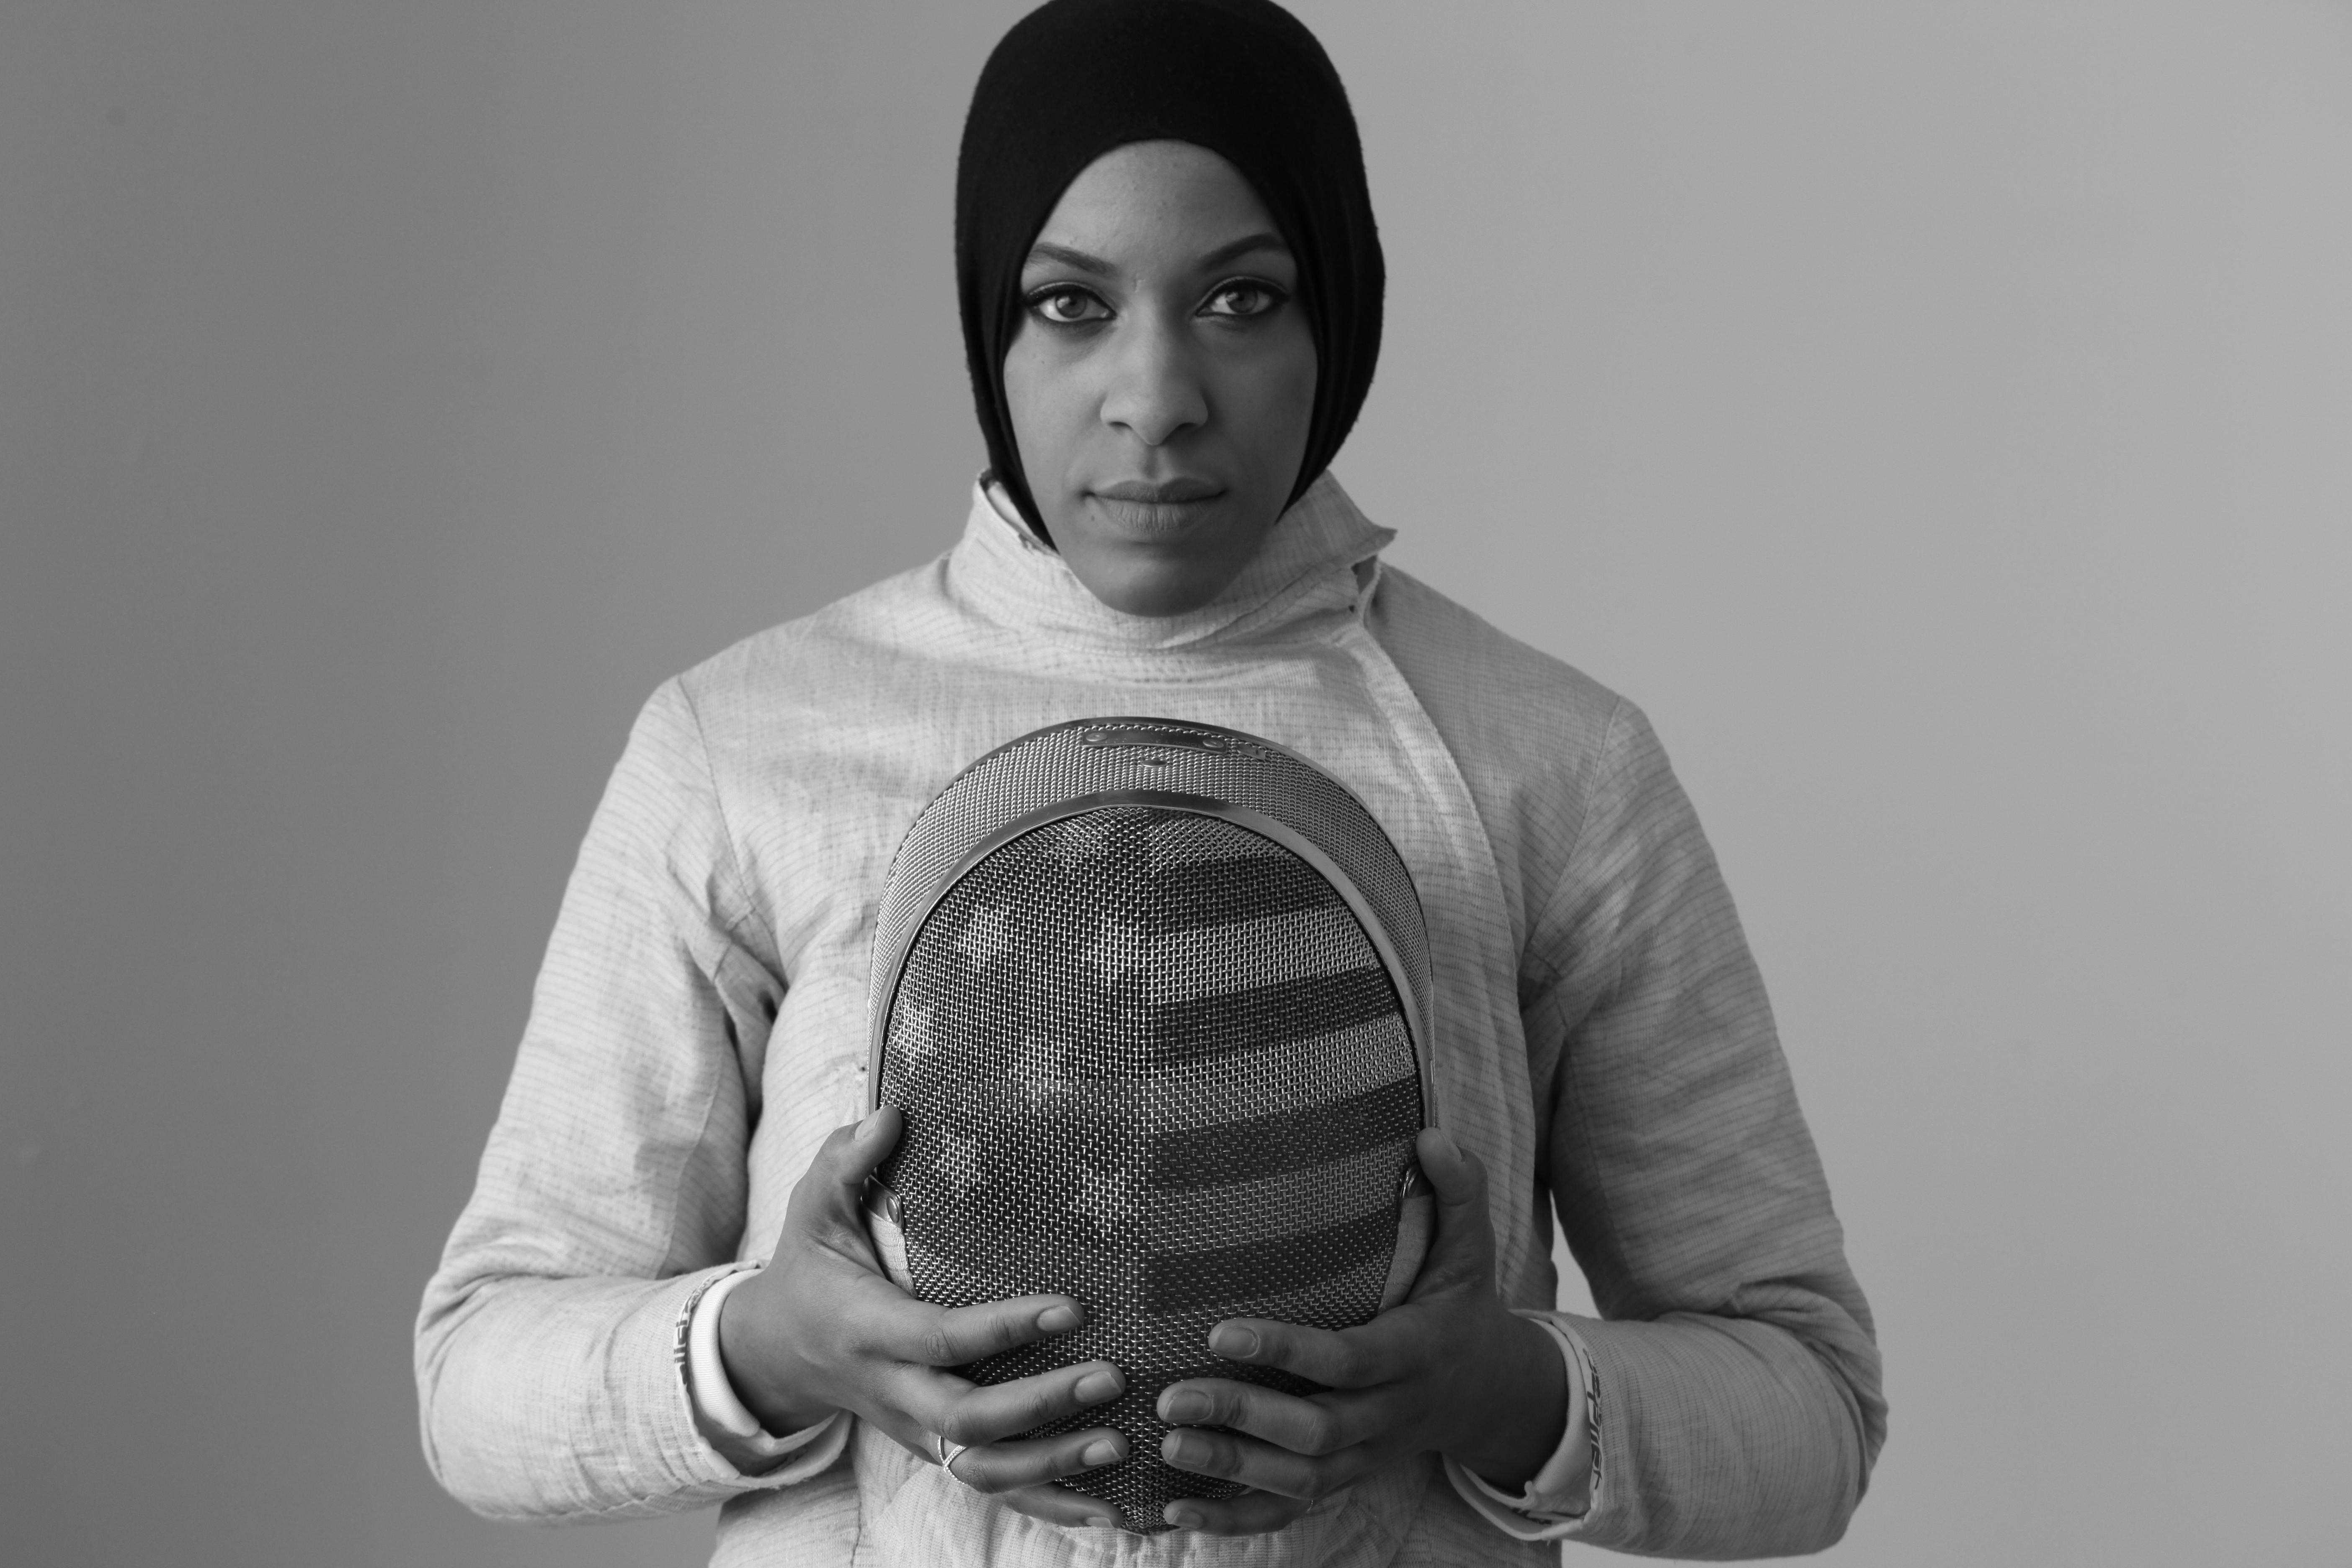 Ibtihaj Muhammad poses for a portrait at Canoe Studios in New York City, New York on March 3, 2016. (Photo by Lynn Johnson/The Players' Tribune)